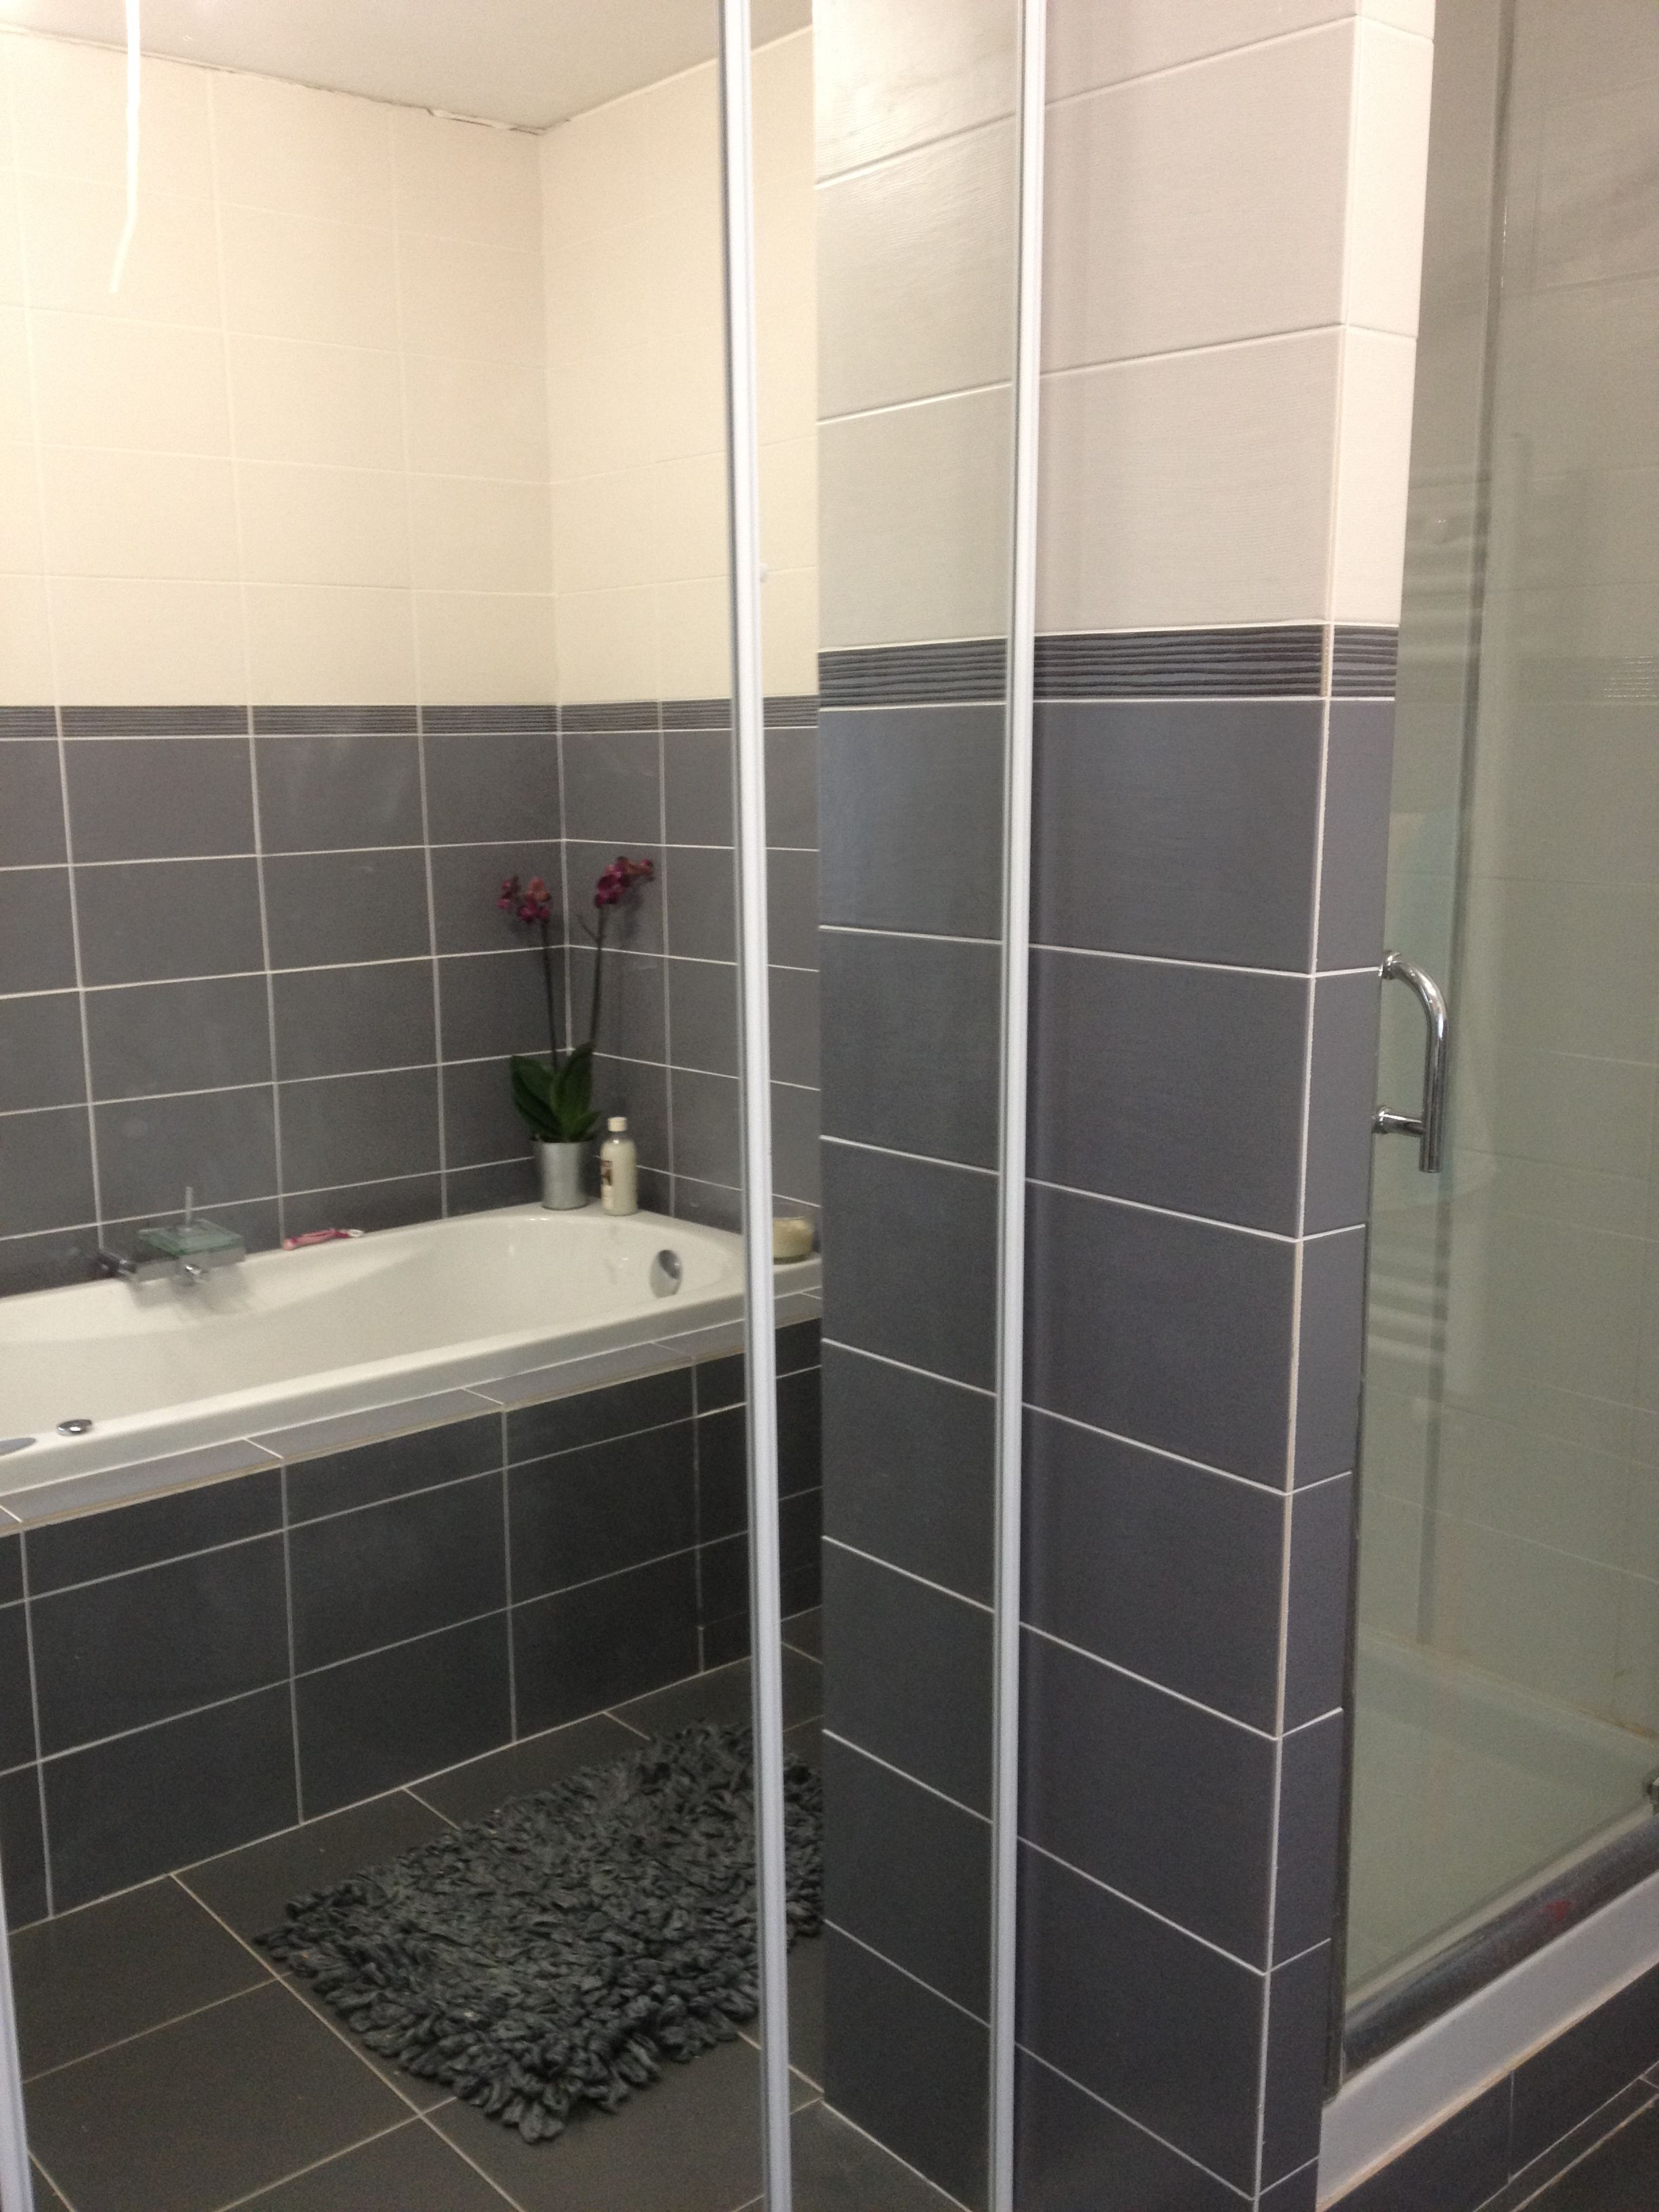 Related For Carrelage Salle De Bain Blanc Et Gris Salle De Bain - Carrelage salle de bain gris